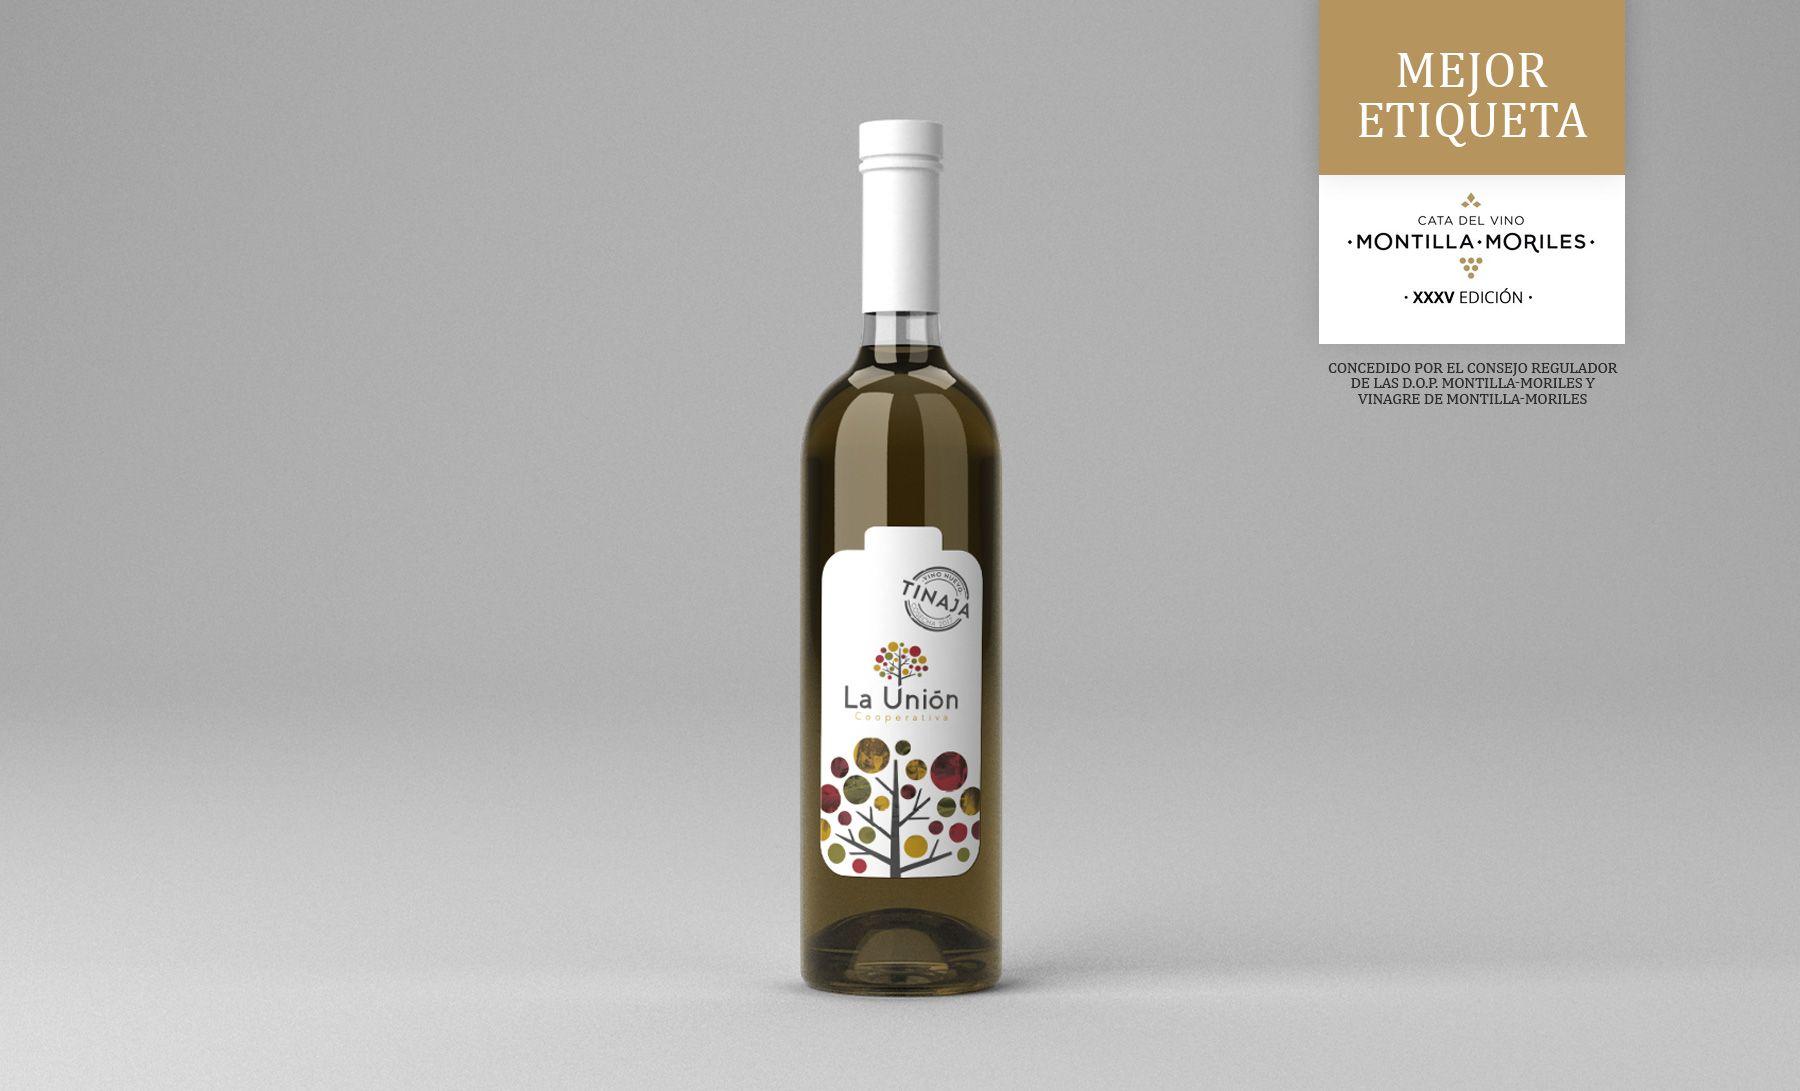 Premio Mejor Etiqueta Cata del Vino Montilla Moriles